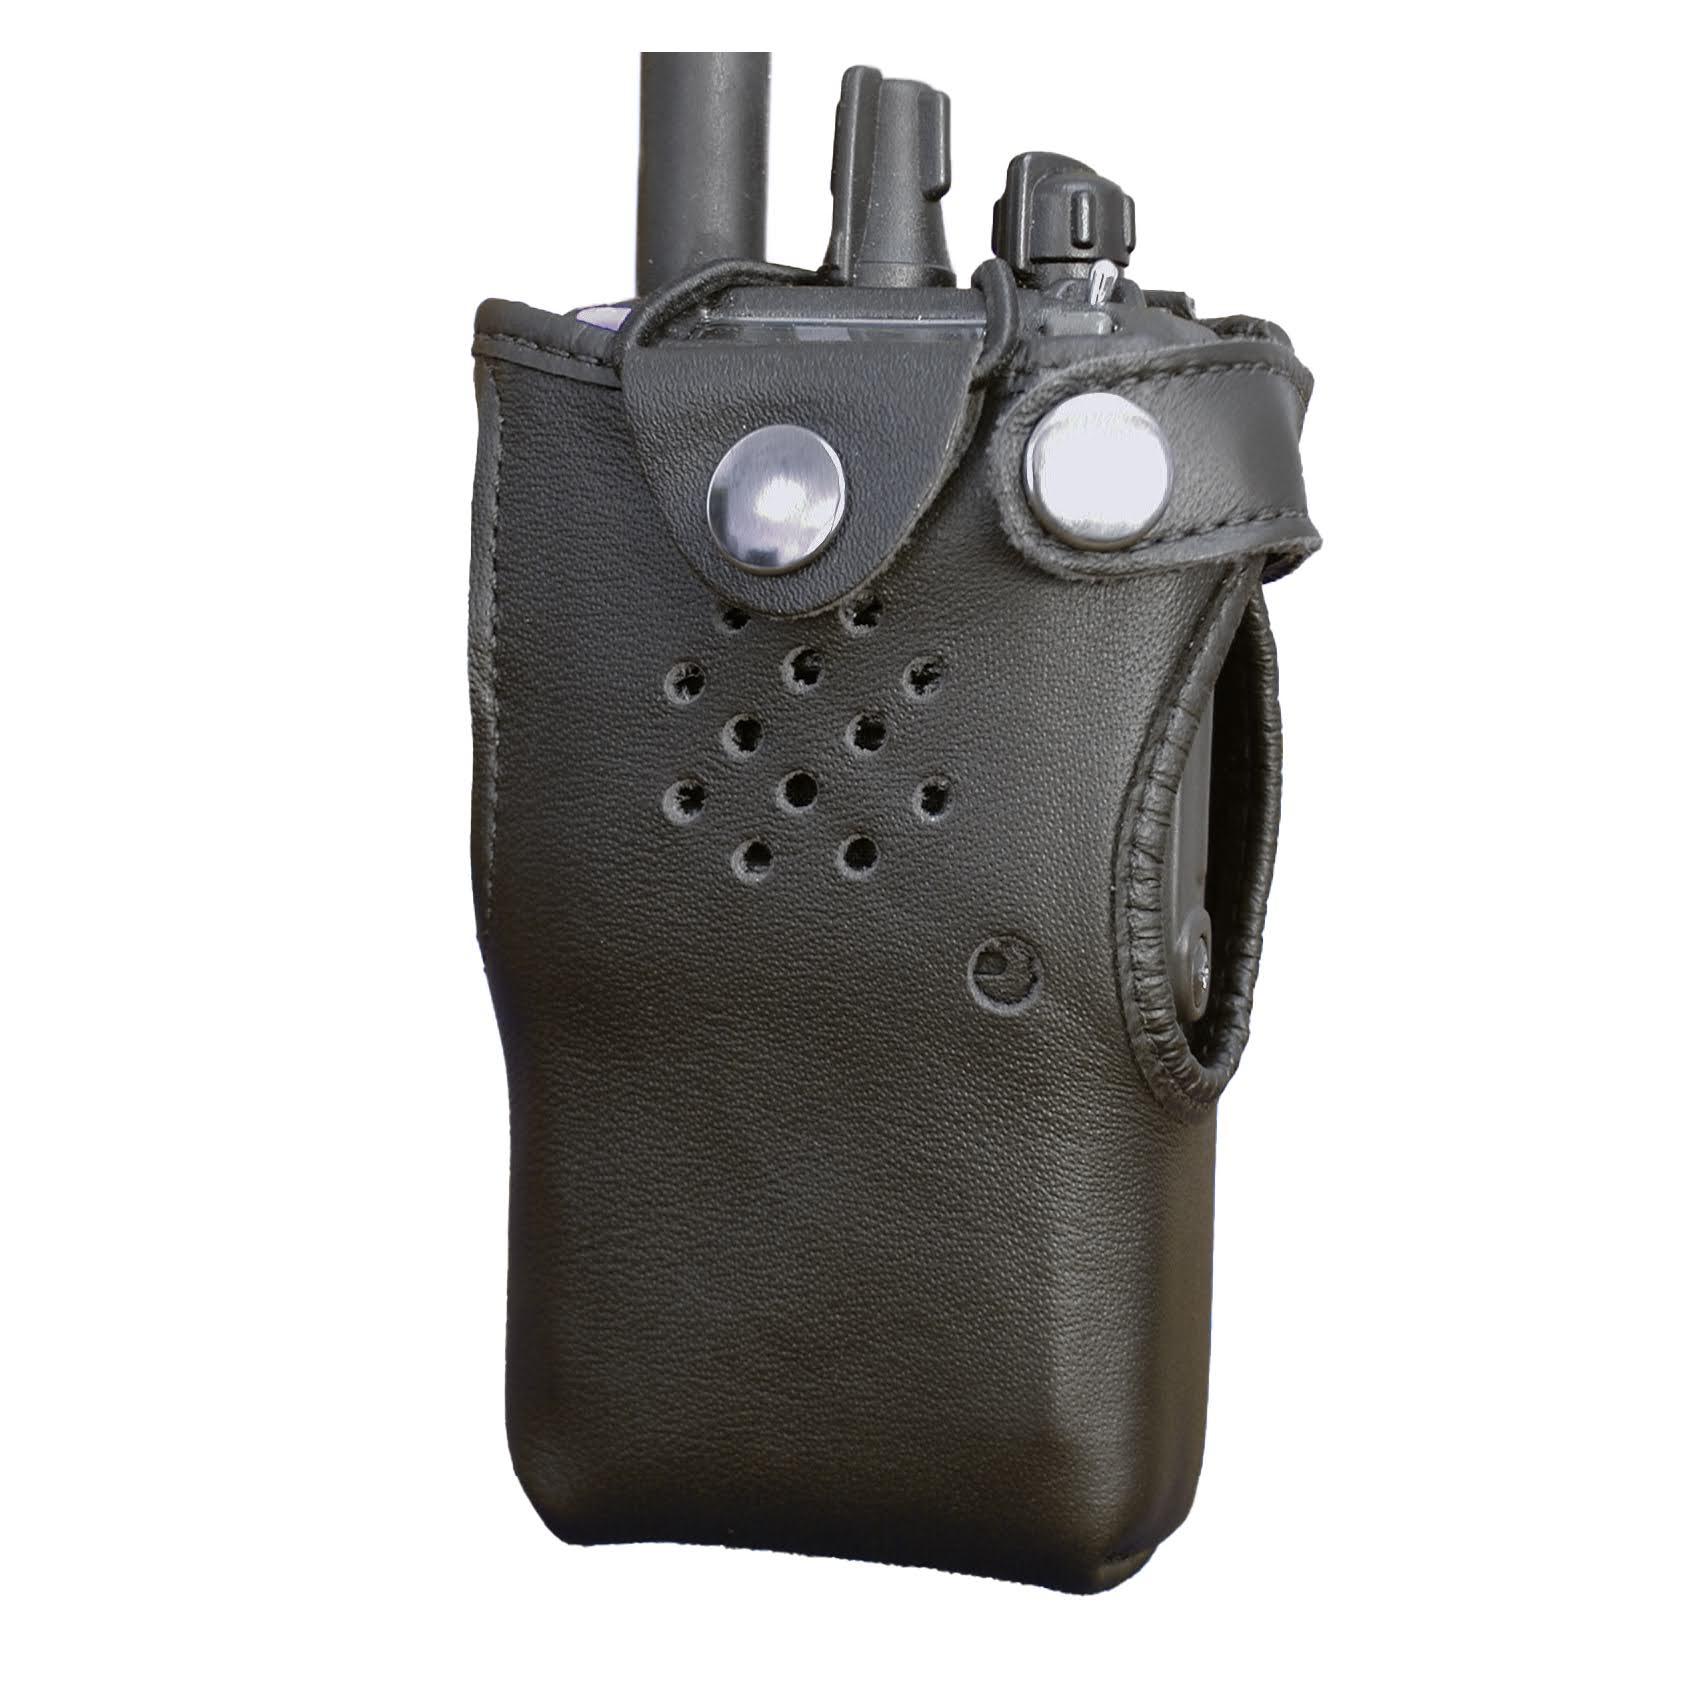 Vertex VX800 Leather Radio Case